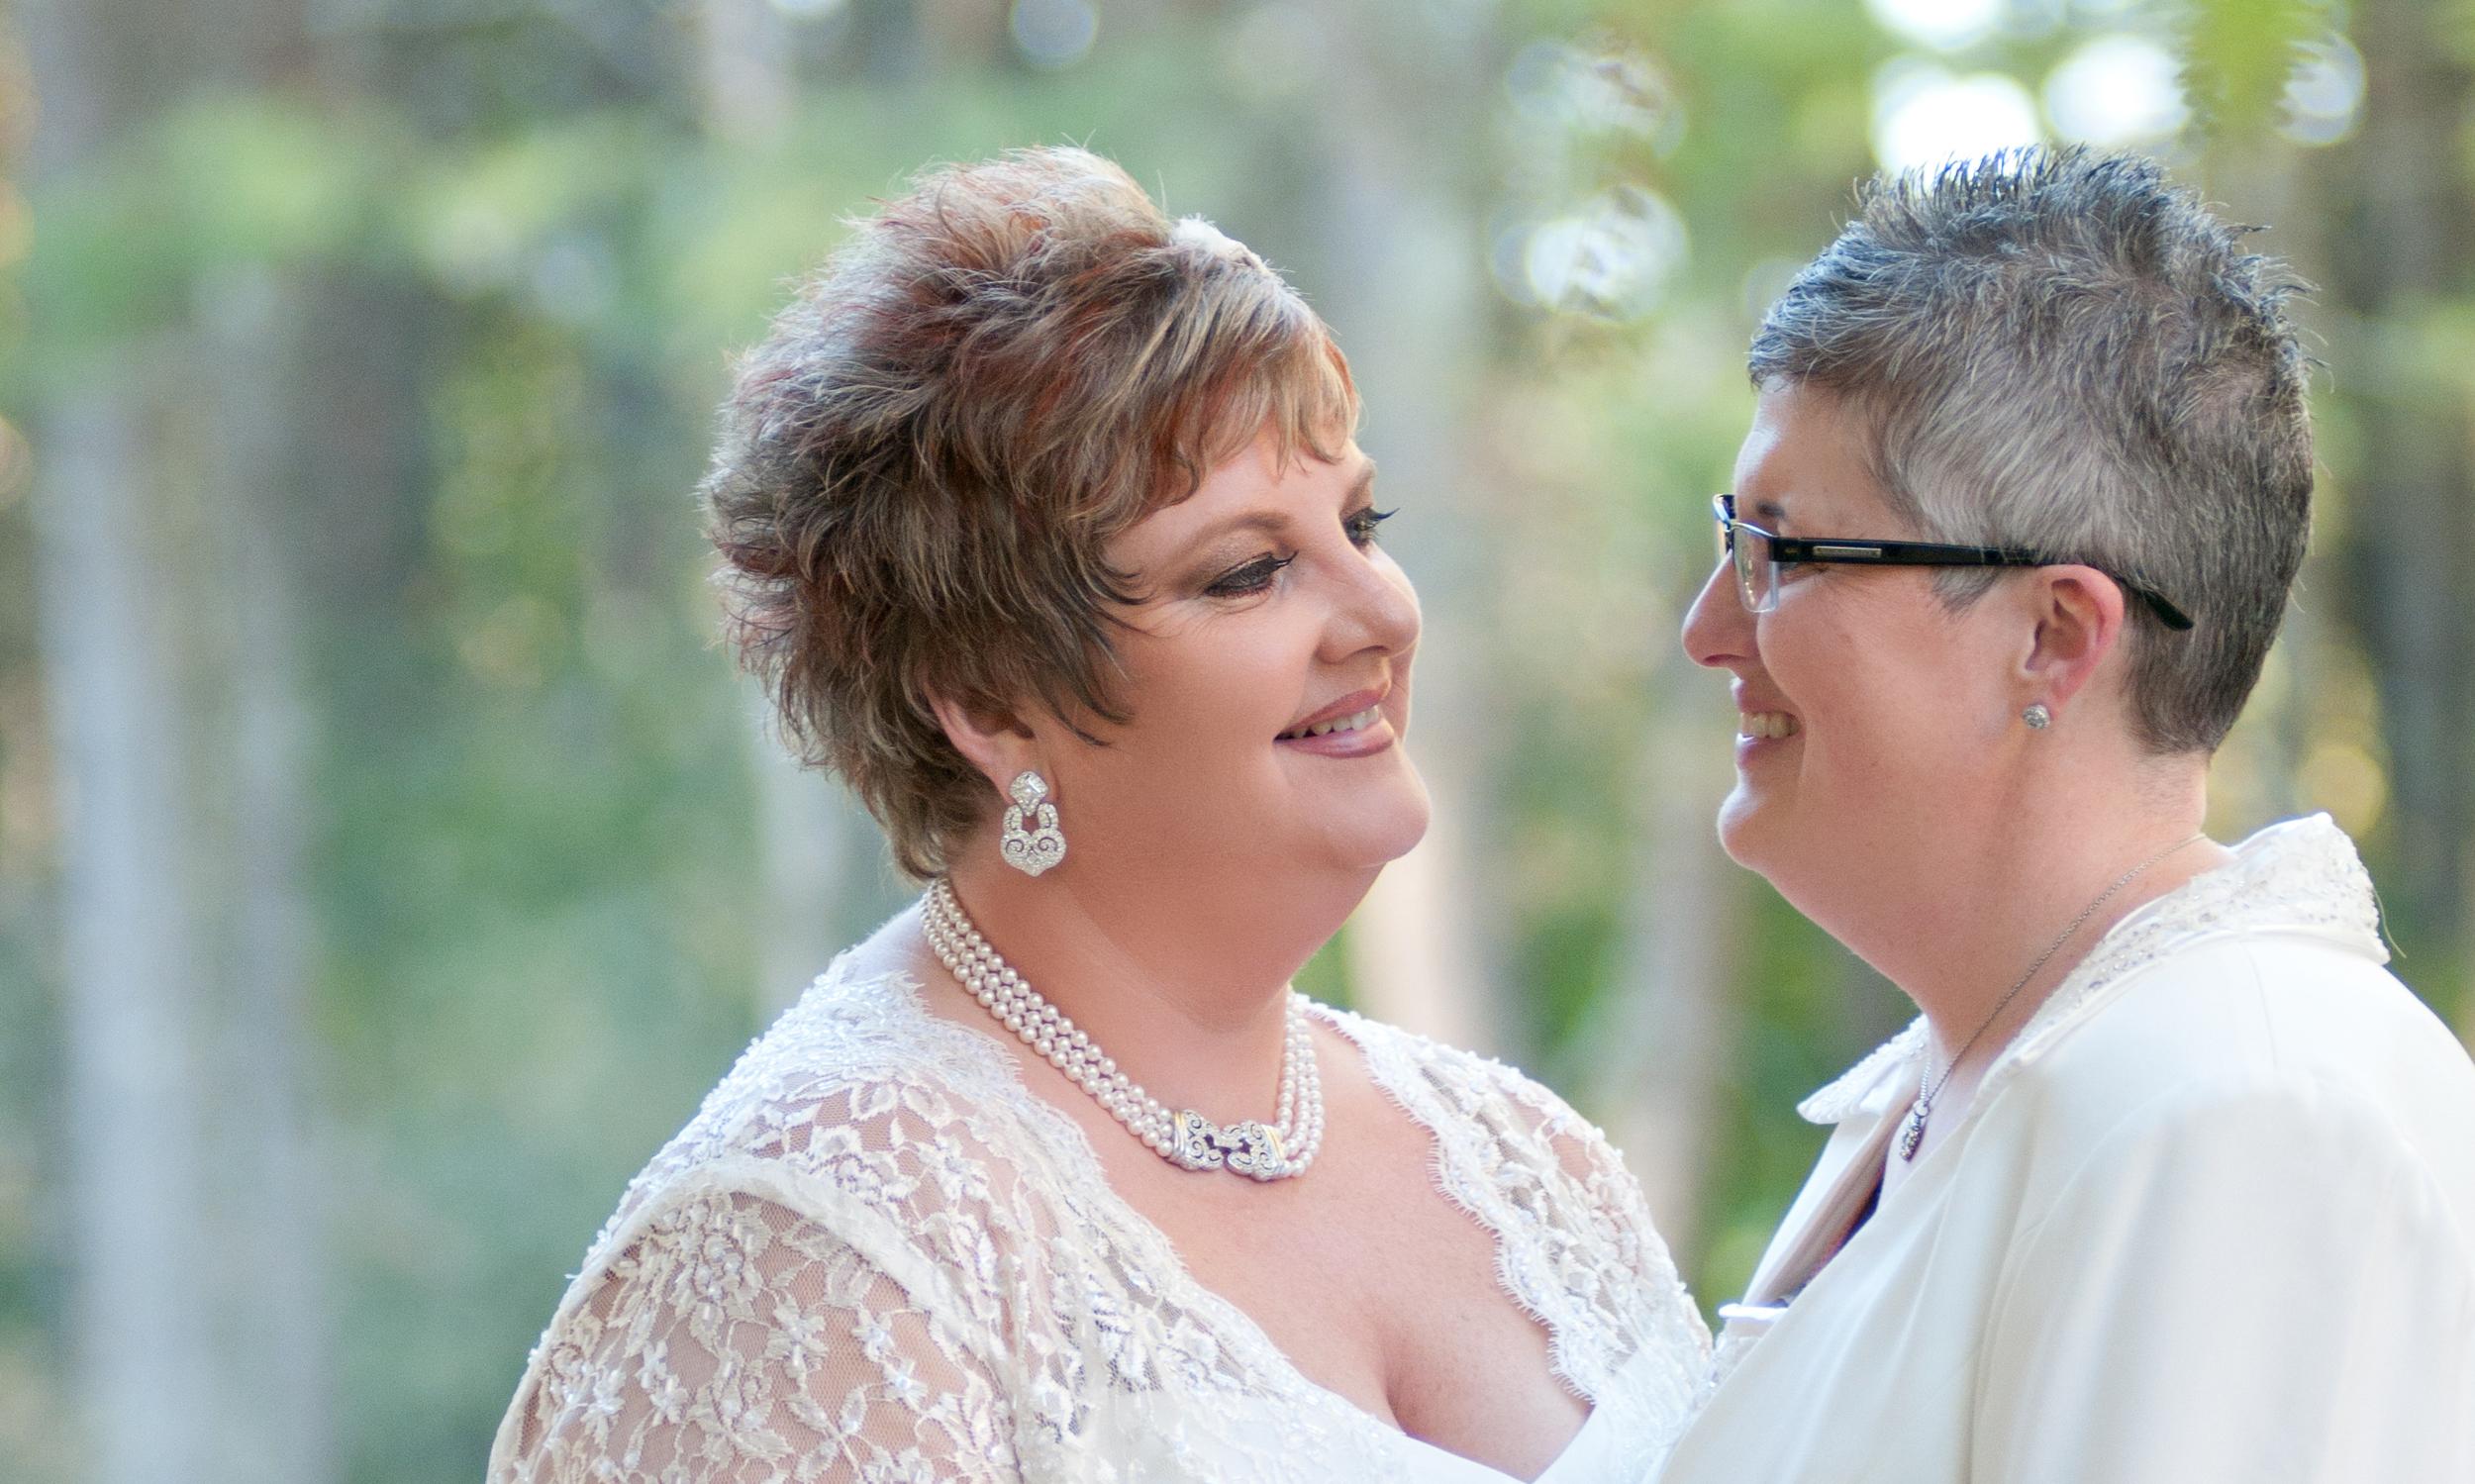 Angela_Chicoski_CT_wedding_photographer_105.jpg